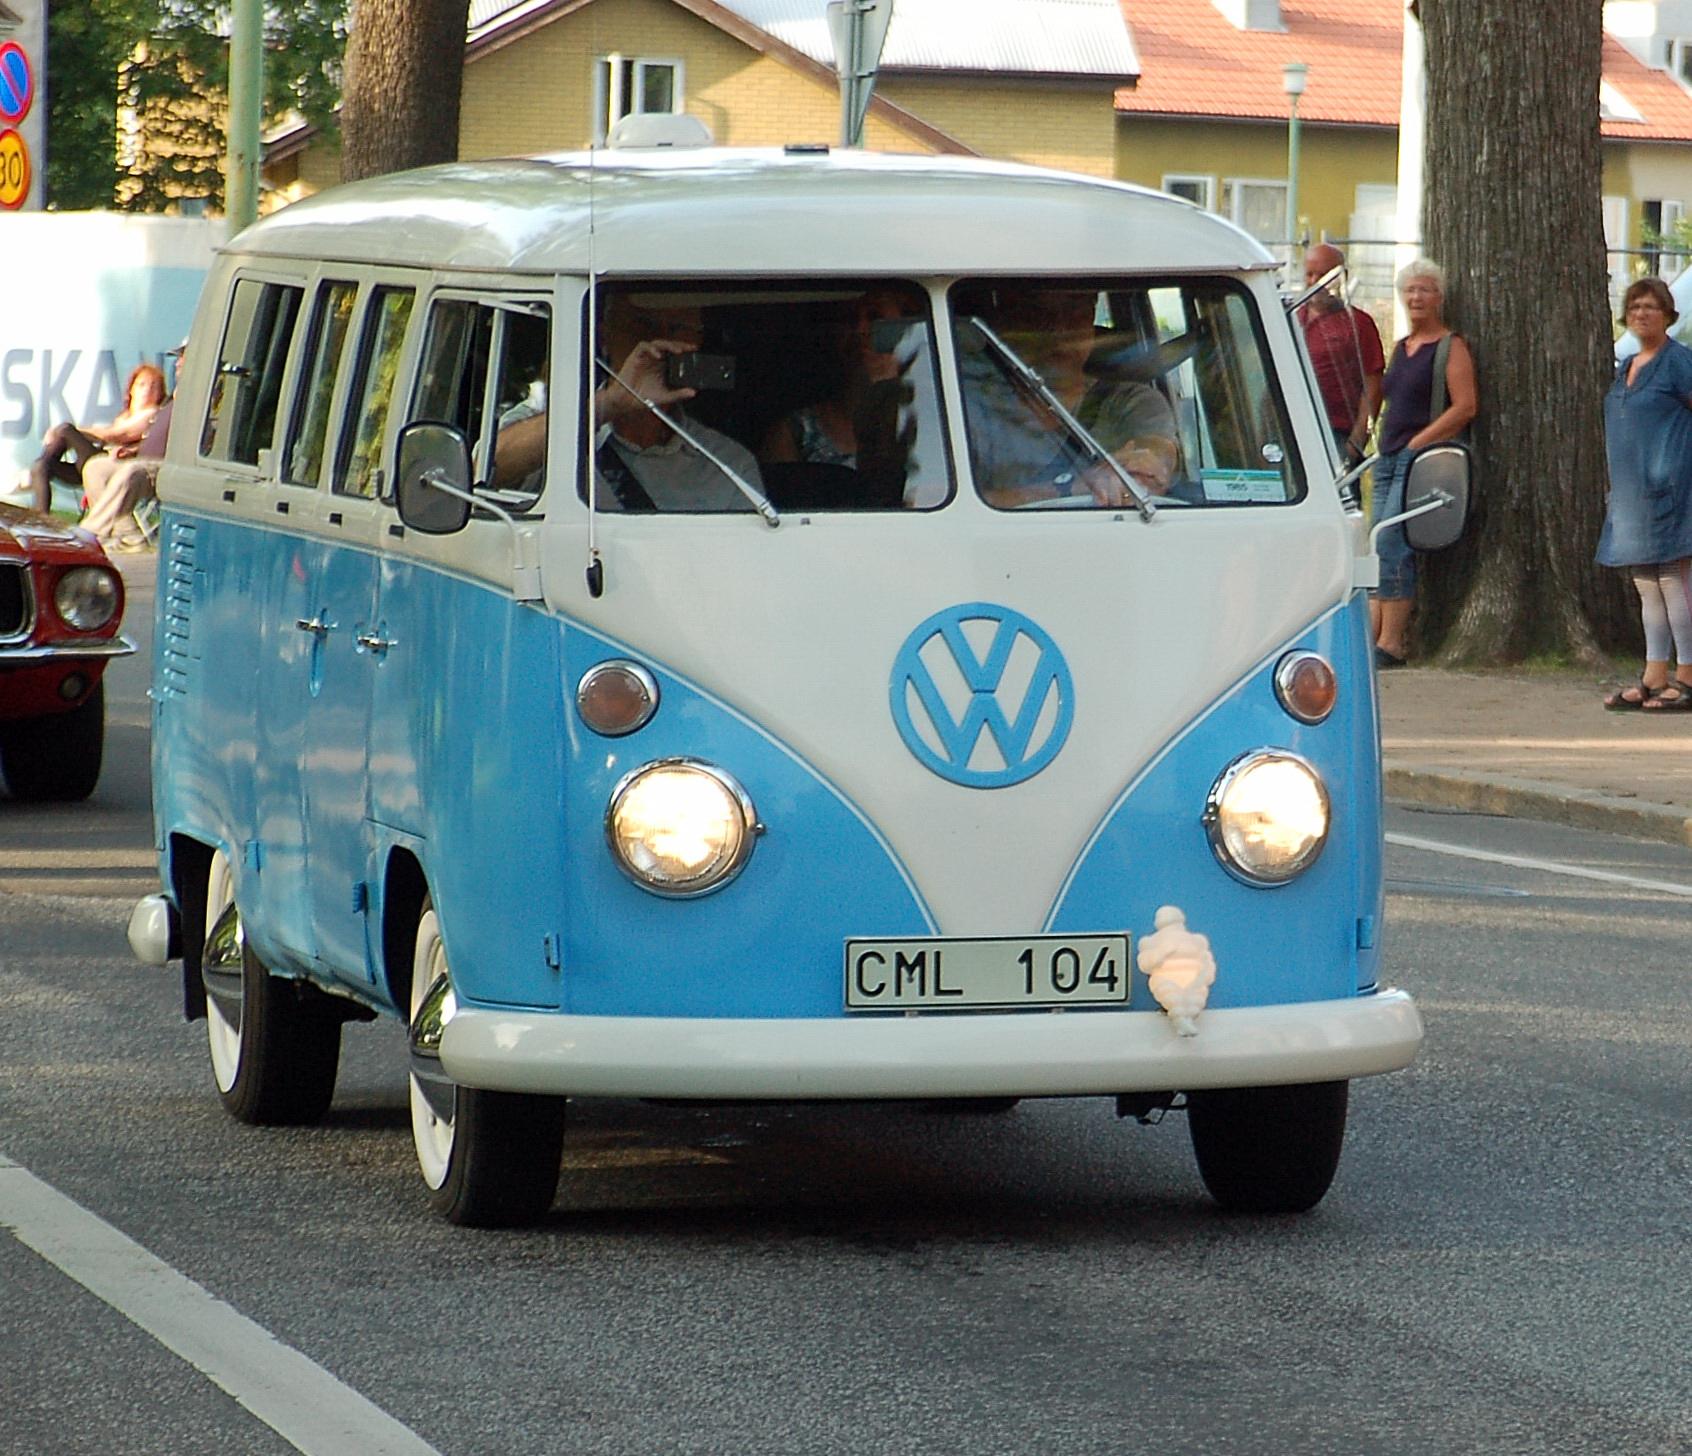 File:VW KLEINBUS 221 JPG - Wikimedia Commons